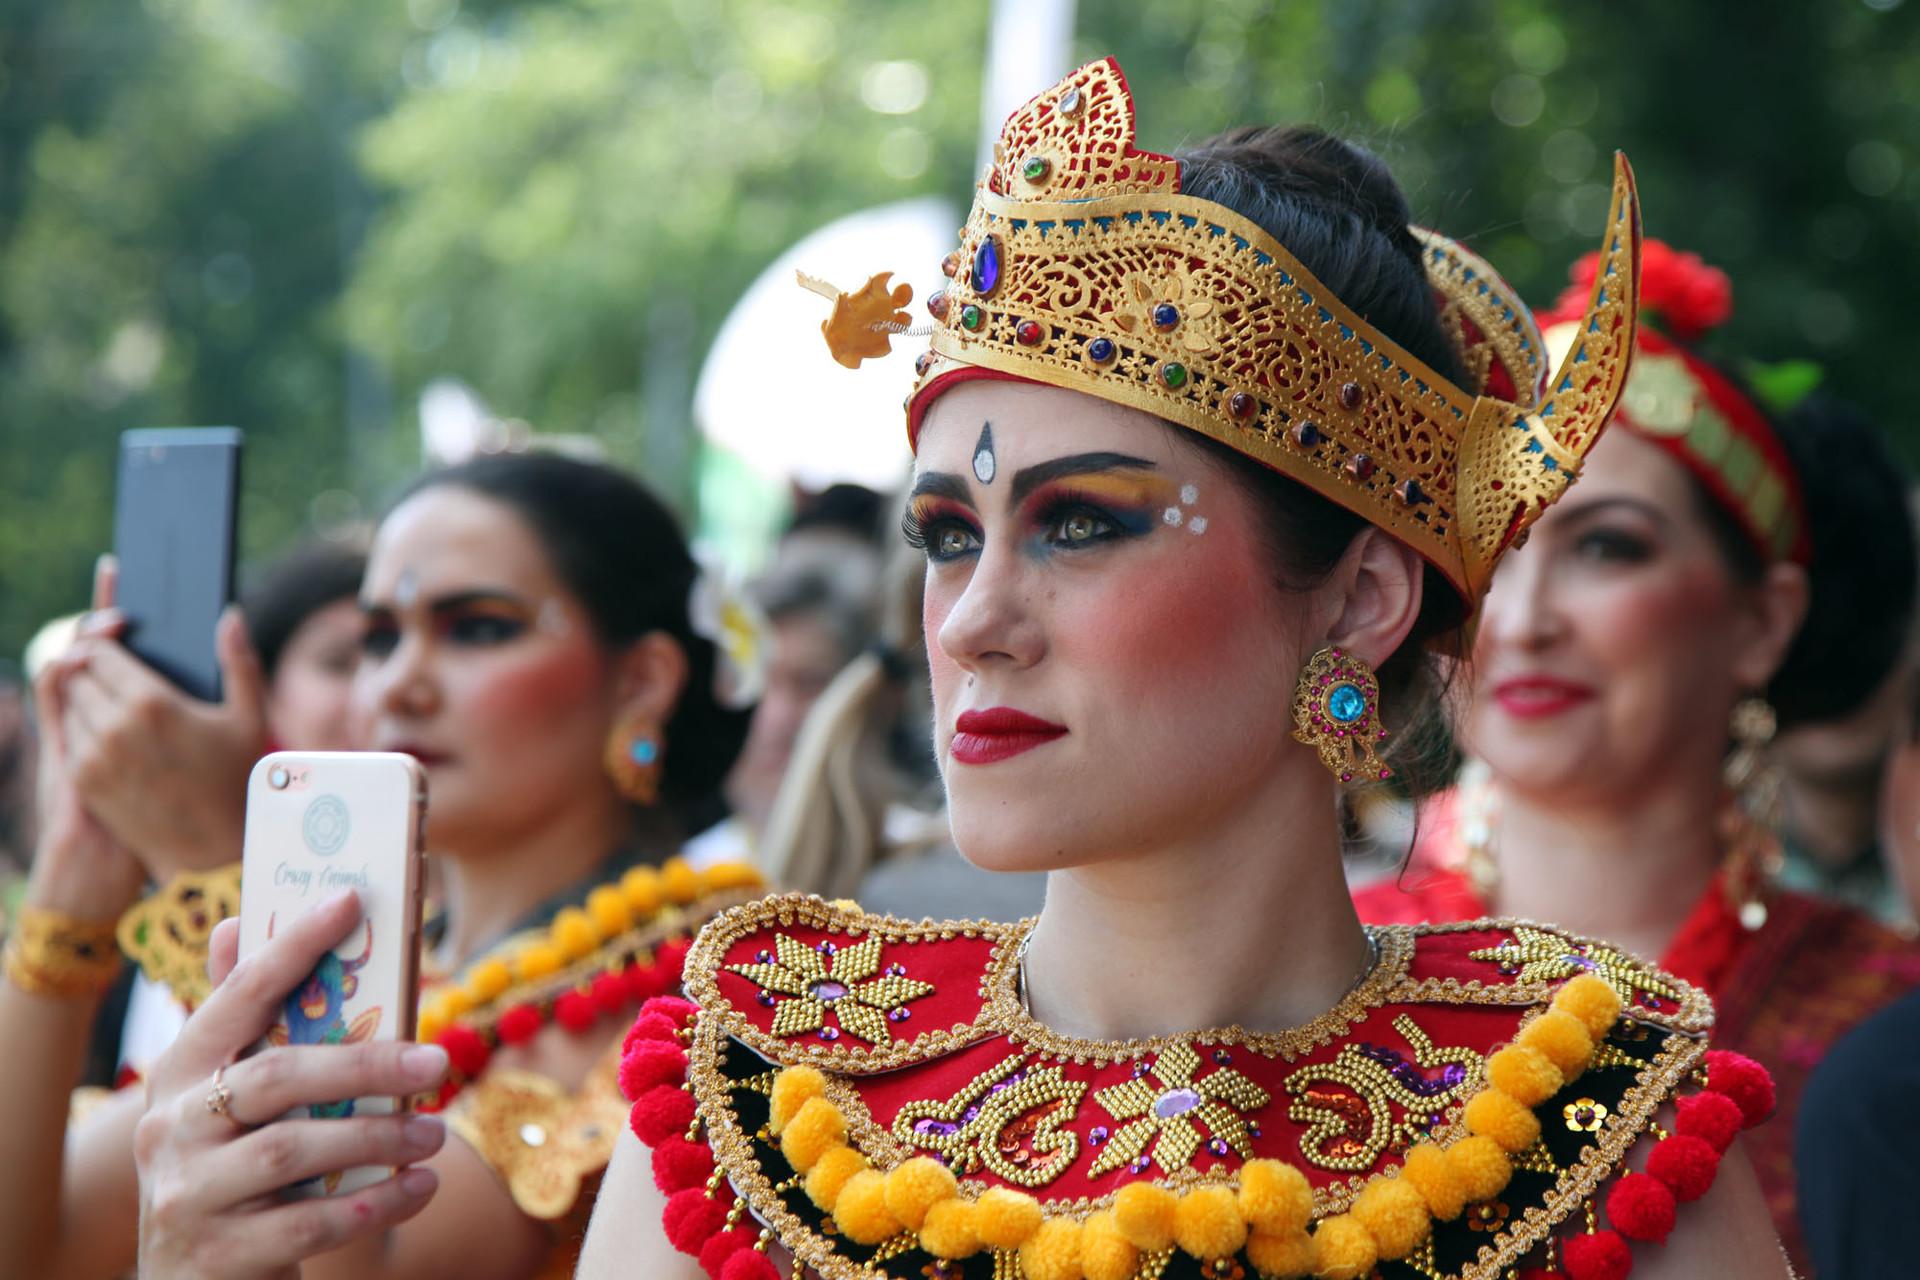 Seorang warga Rusia mengenakan pakaian tradisional Bali pada Festival Indonesia 2018 di Taman Krasnaya Presnya, Moskow, Jumat (3/8).